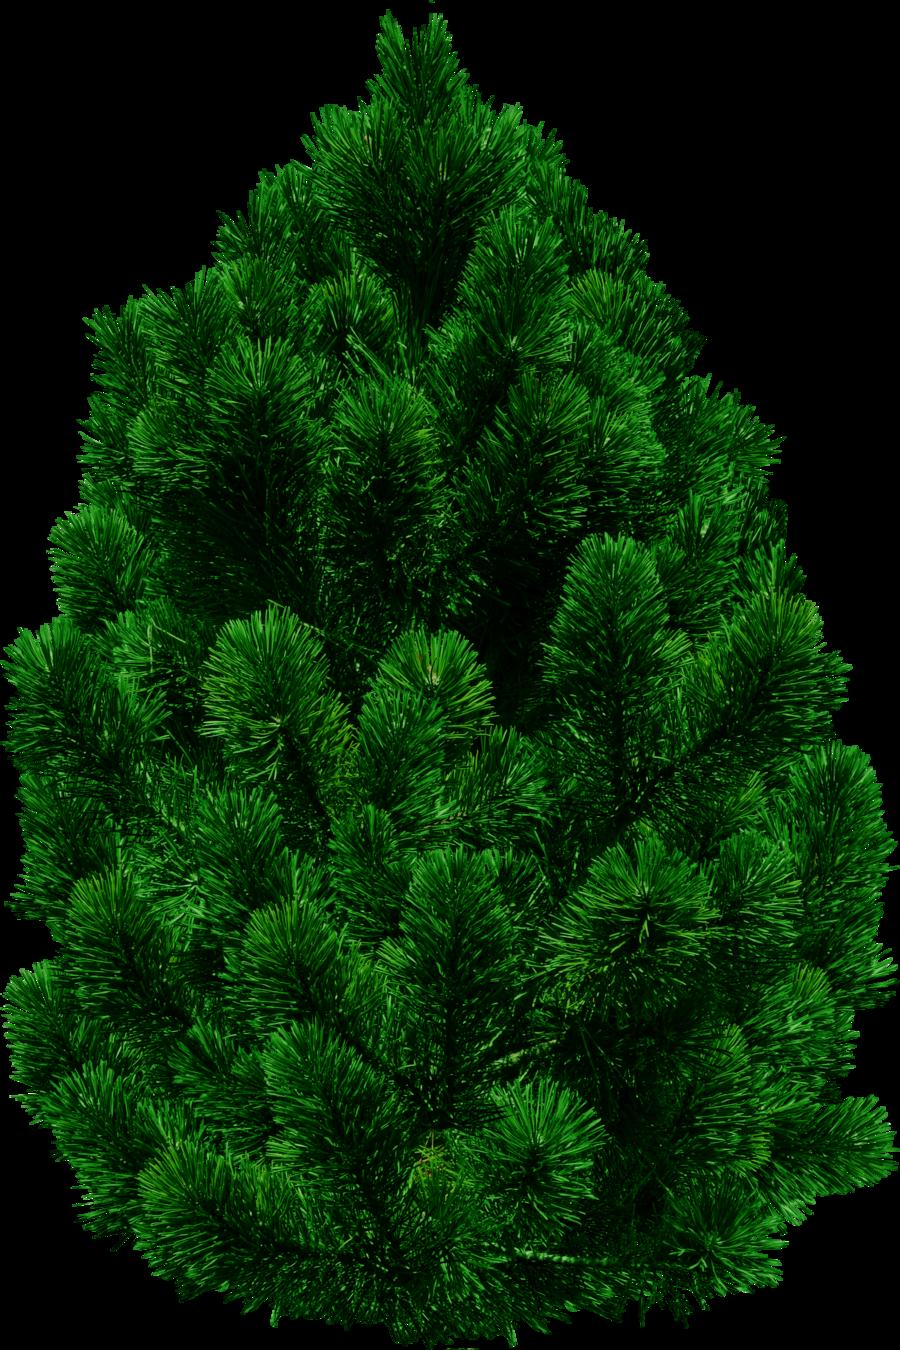 Fir Natural Tree PNG Image